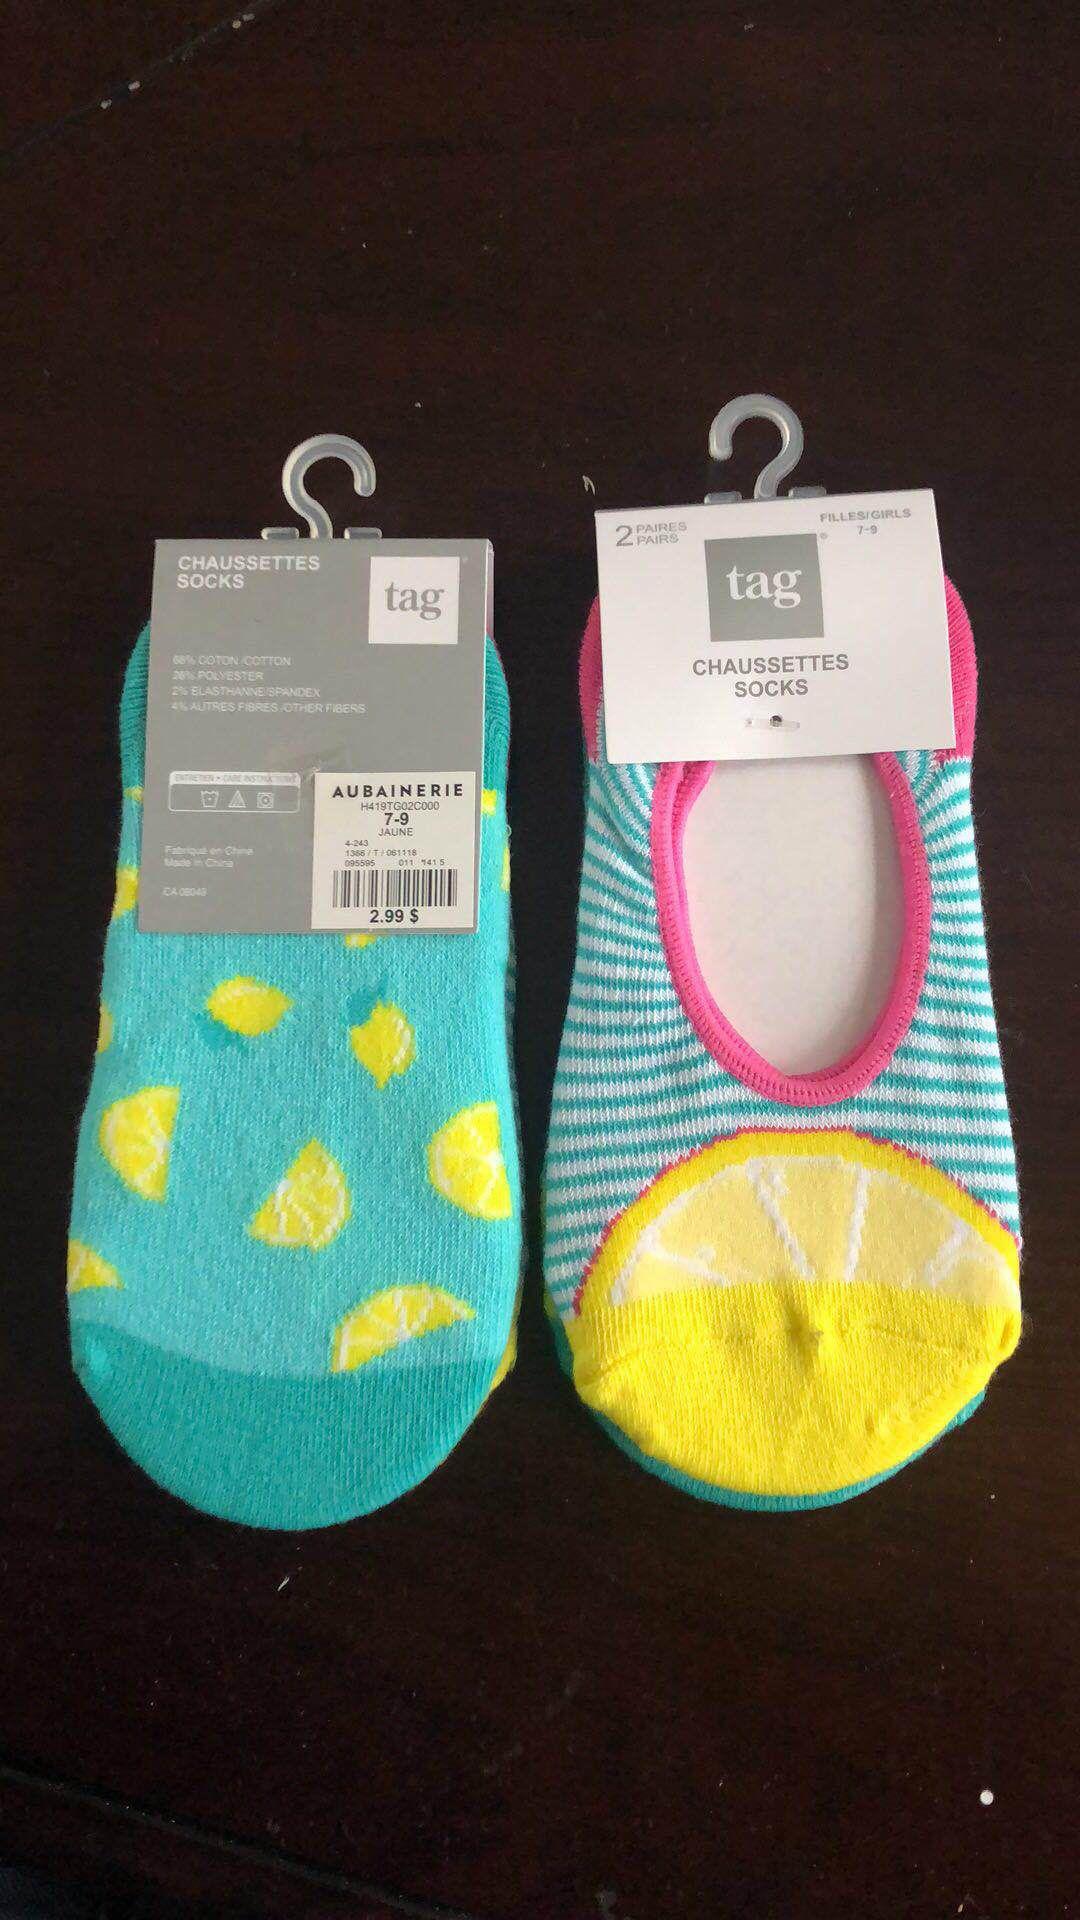 Autumn and winter new Japanese women's socks boat socks ladies cotton socks